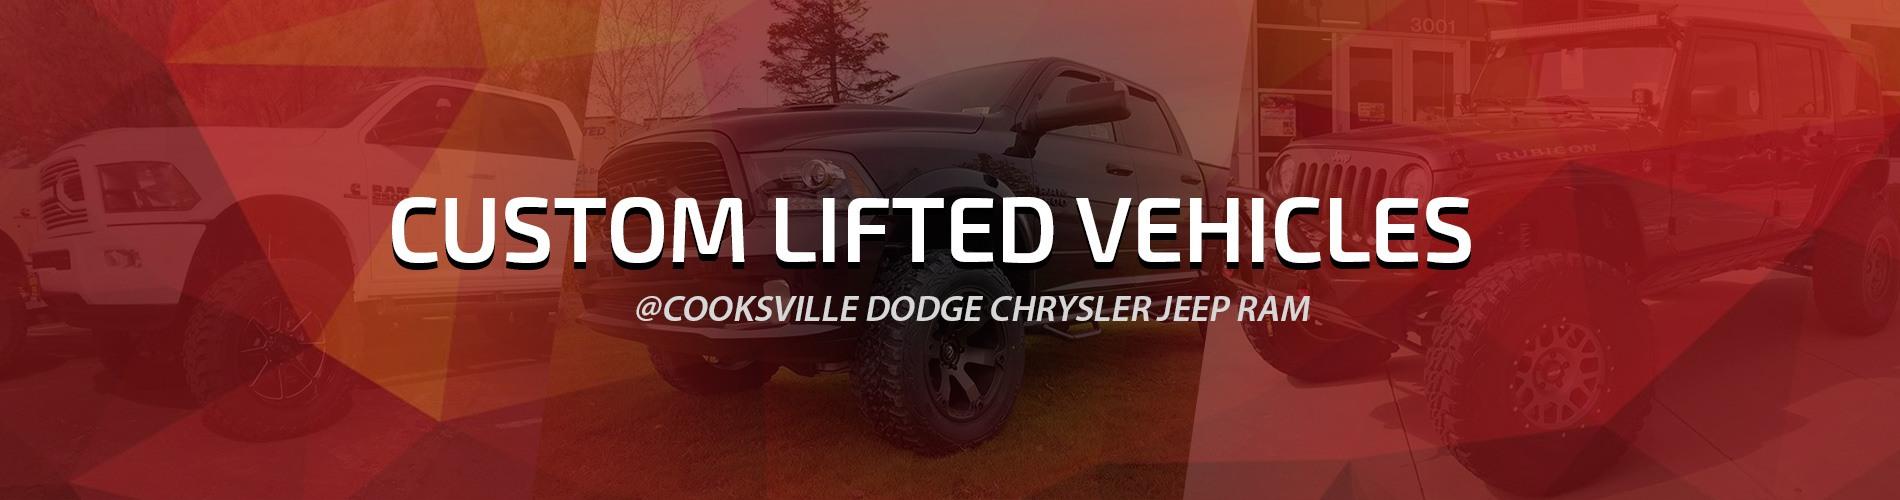 Custom-Lifted-Vehicles